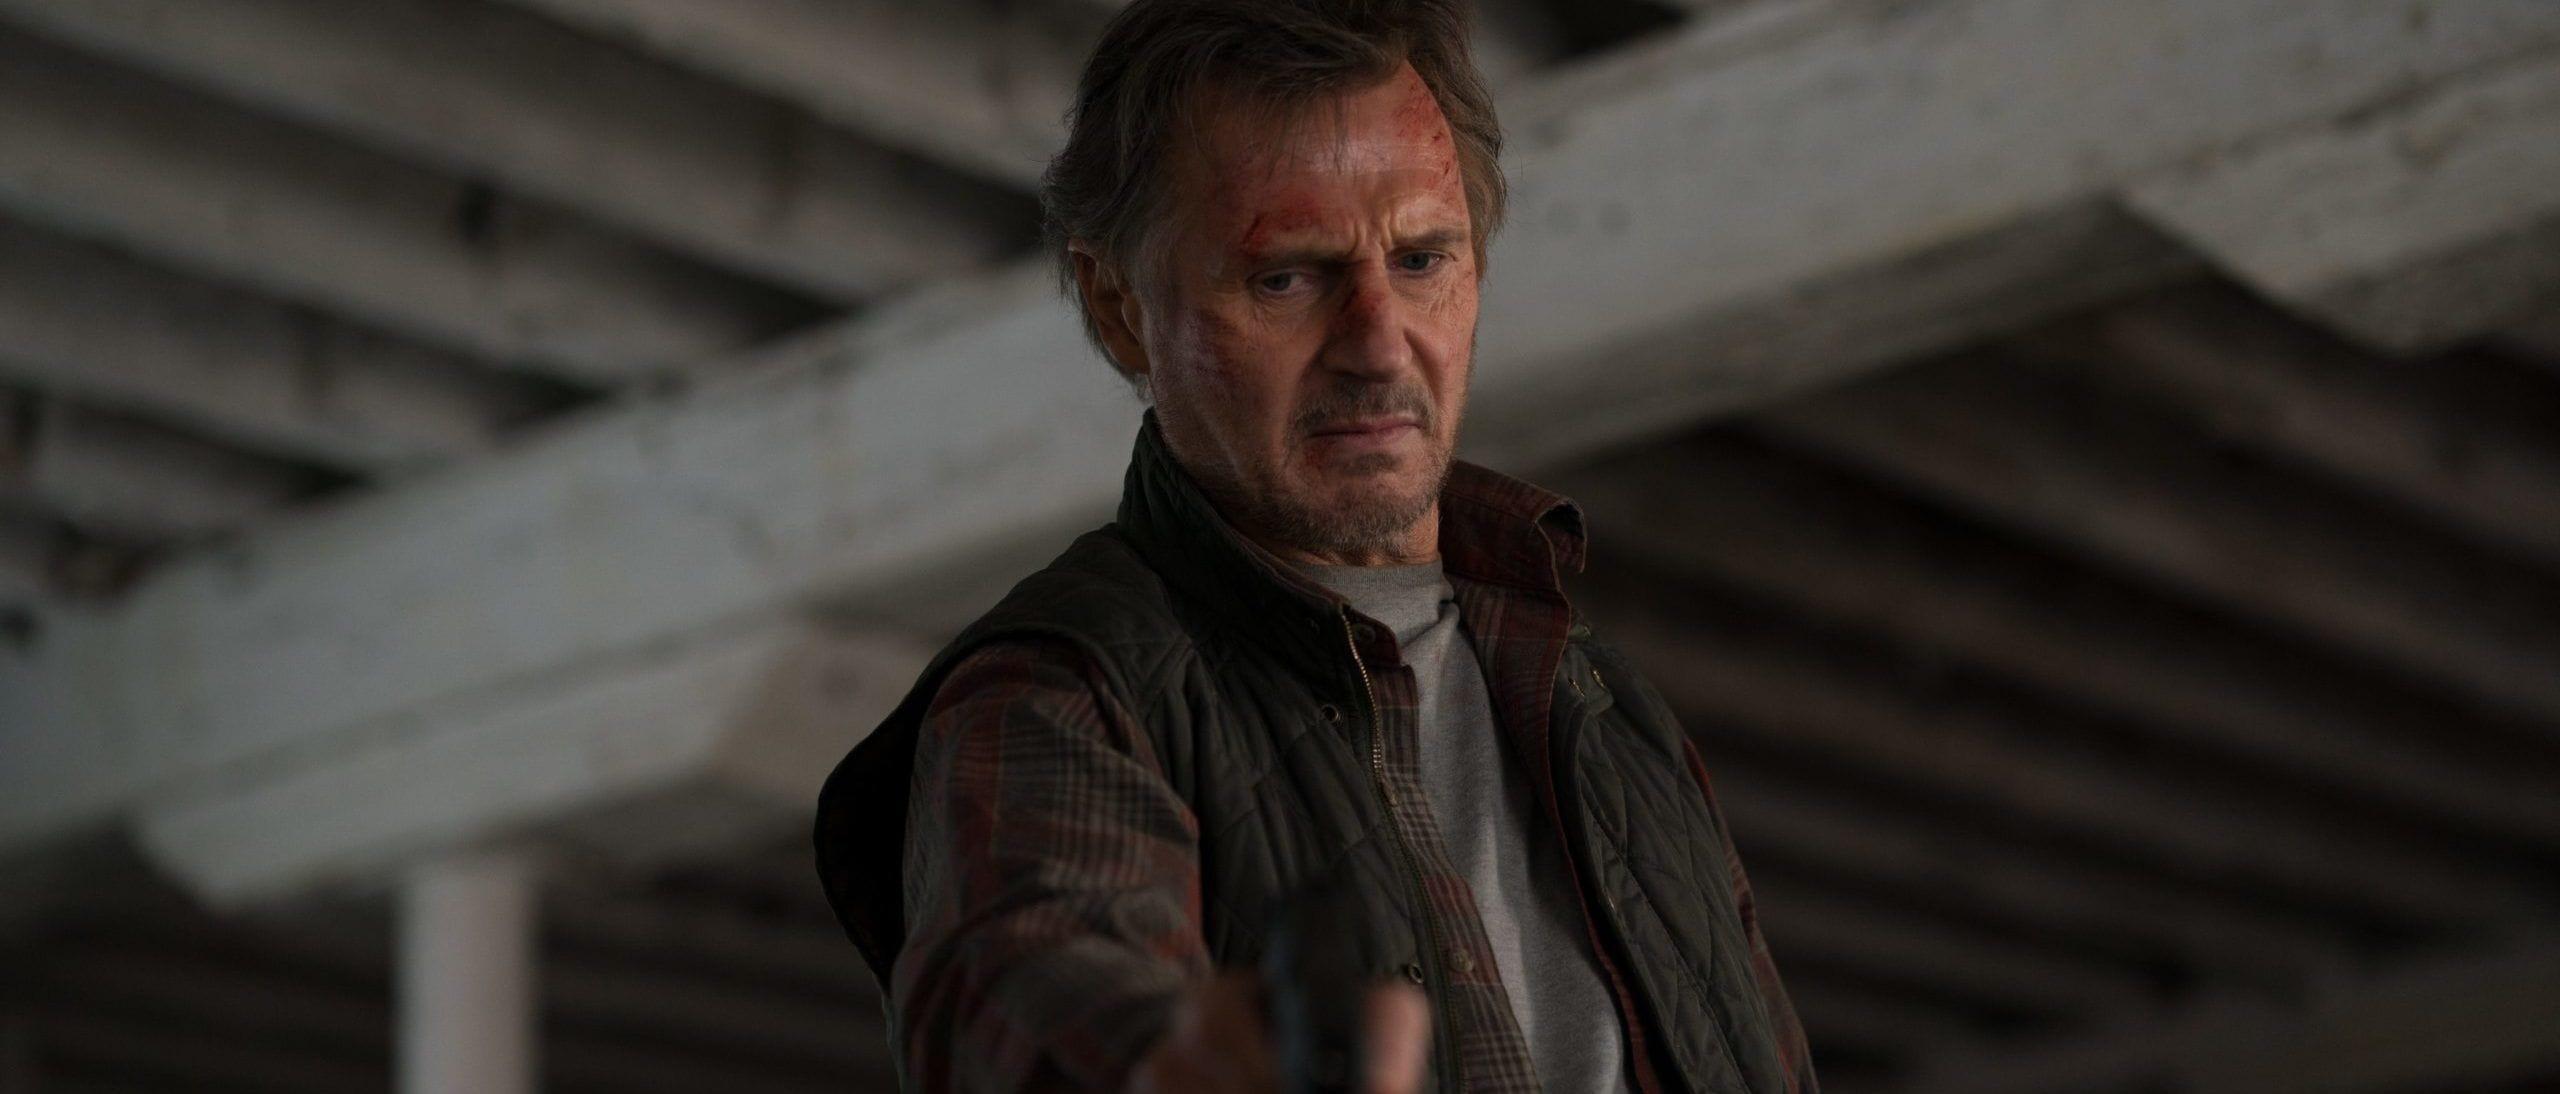 the-marksman action movies liam neeson worldwide box office